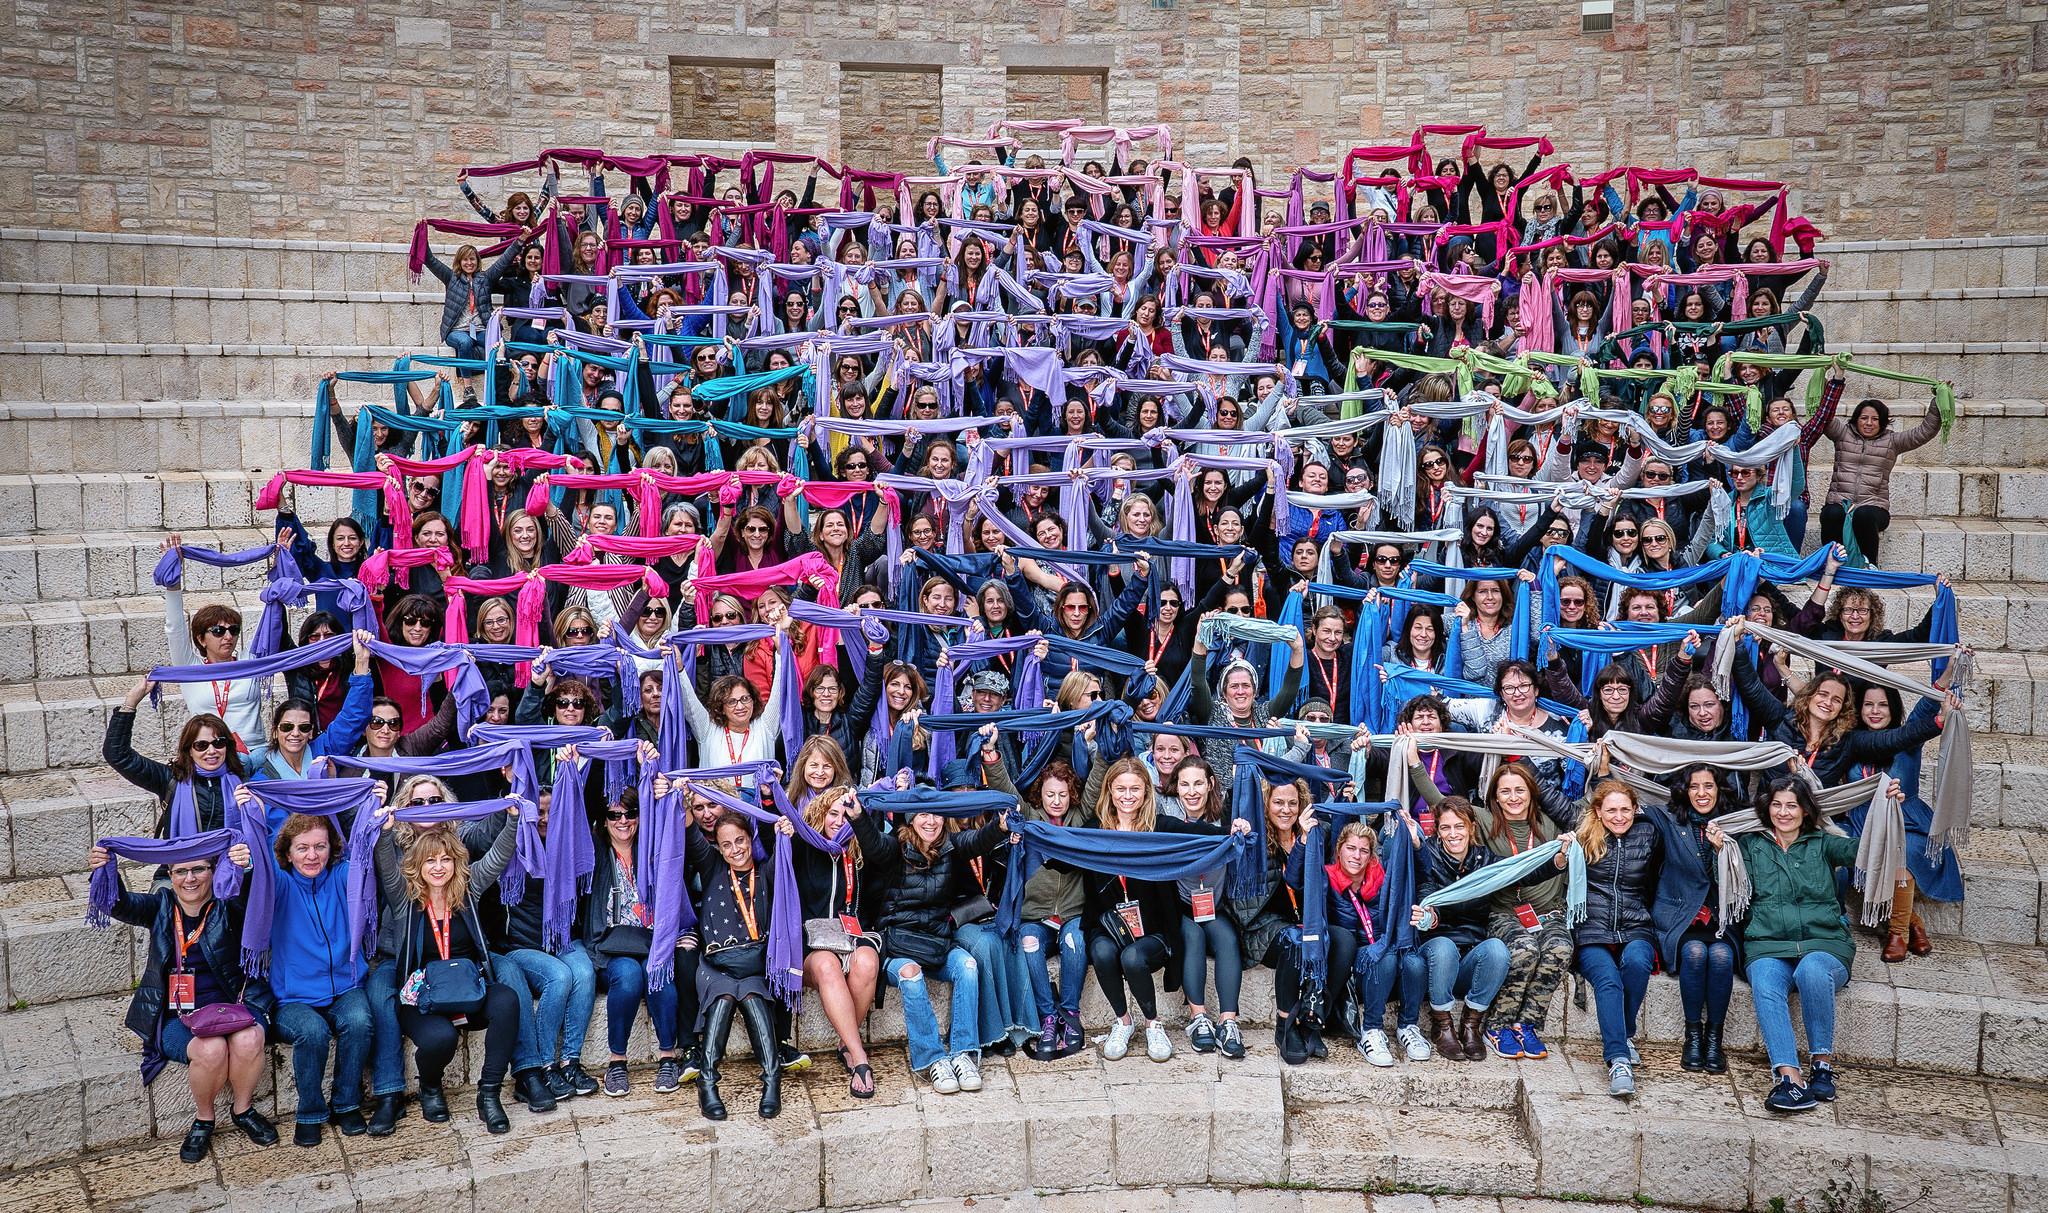 Momentum - Formerly Jewish Women's Renaissance Project (JWRP)